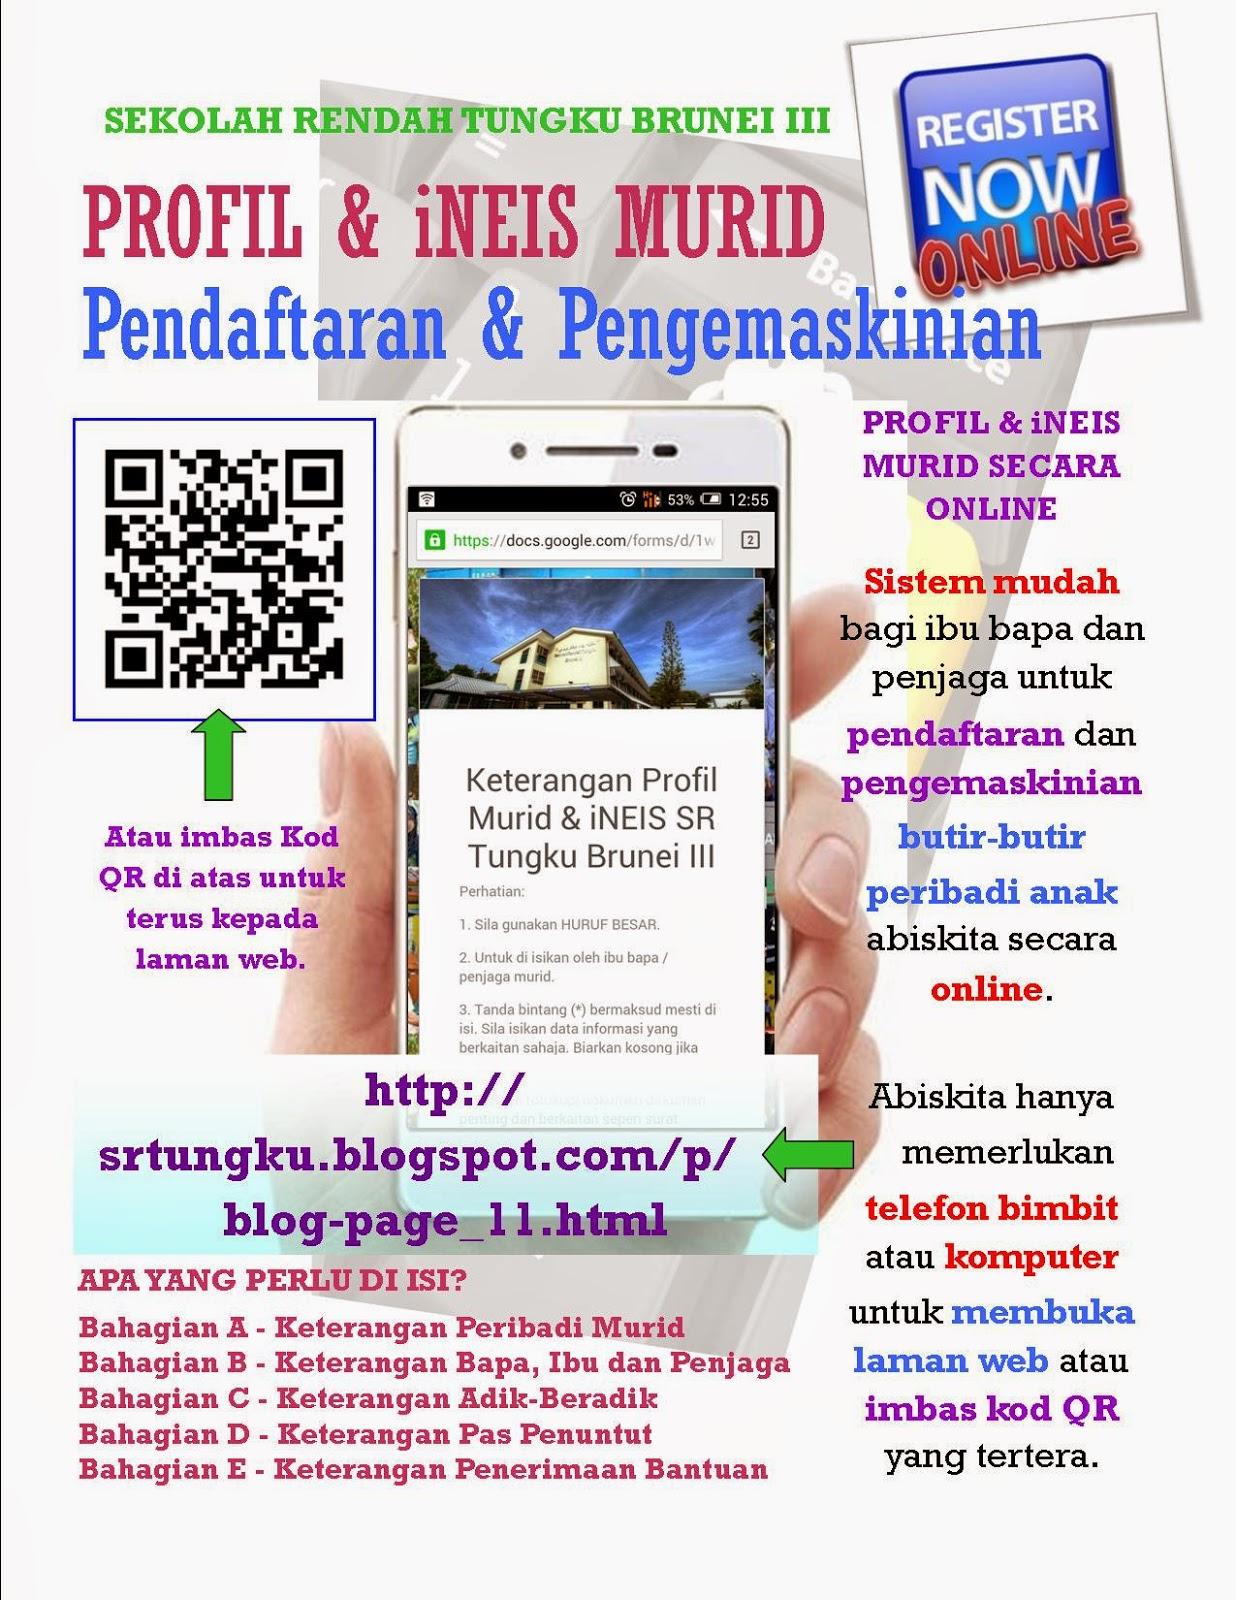 Pendaftaran Profil & iNEIS Online